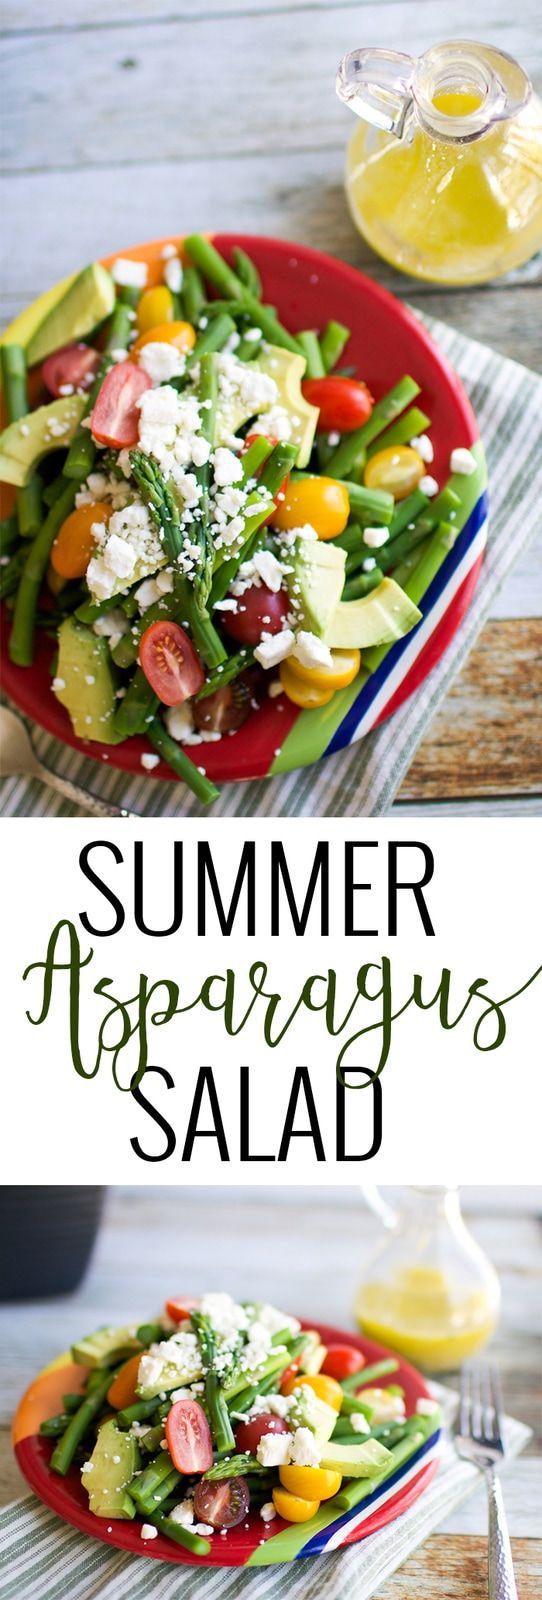 Summer Asparagus Salad Recipe Oh So Delicioso Recipe Dairy Free Vegetable Recipes Asparagus Recipe Homemade Salads [ 1600 x 542 Pixel ]